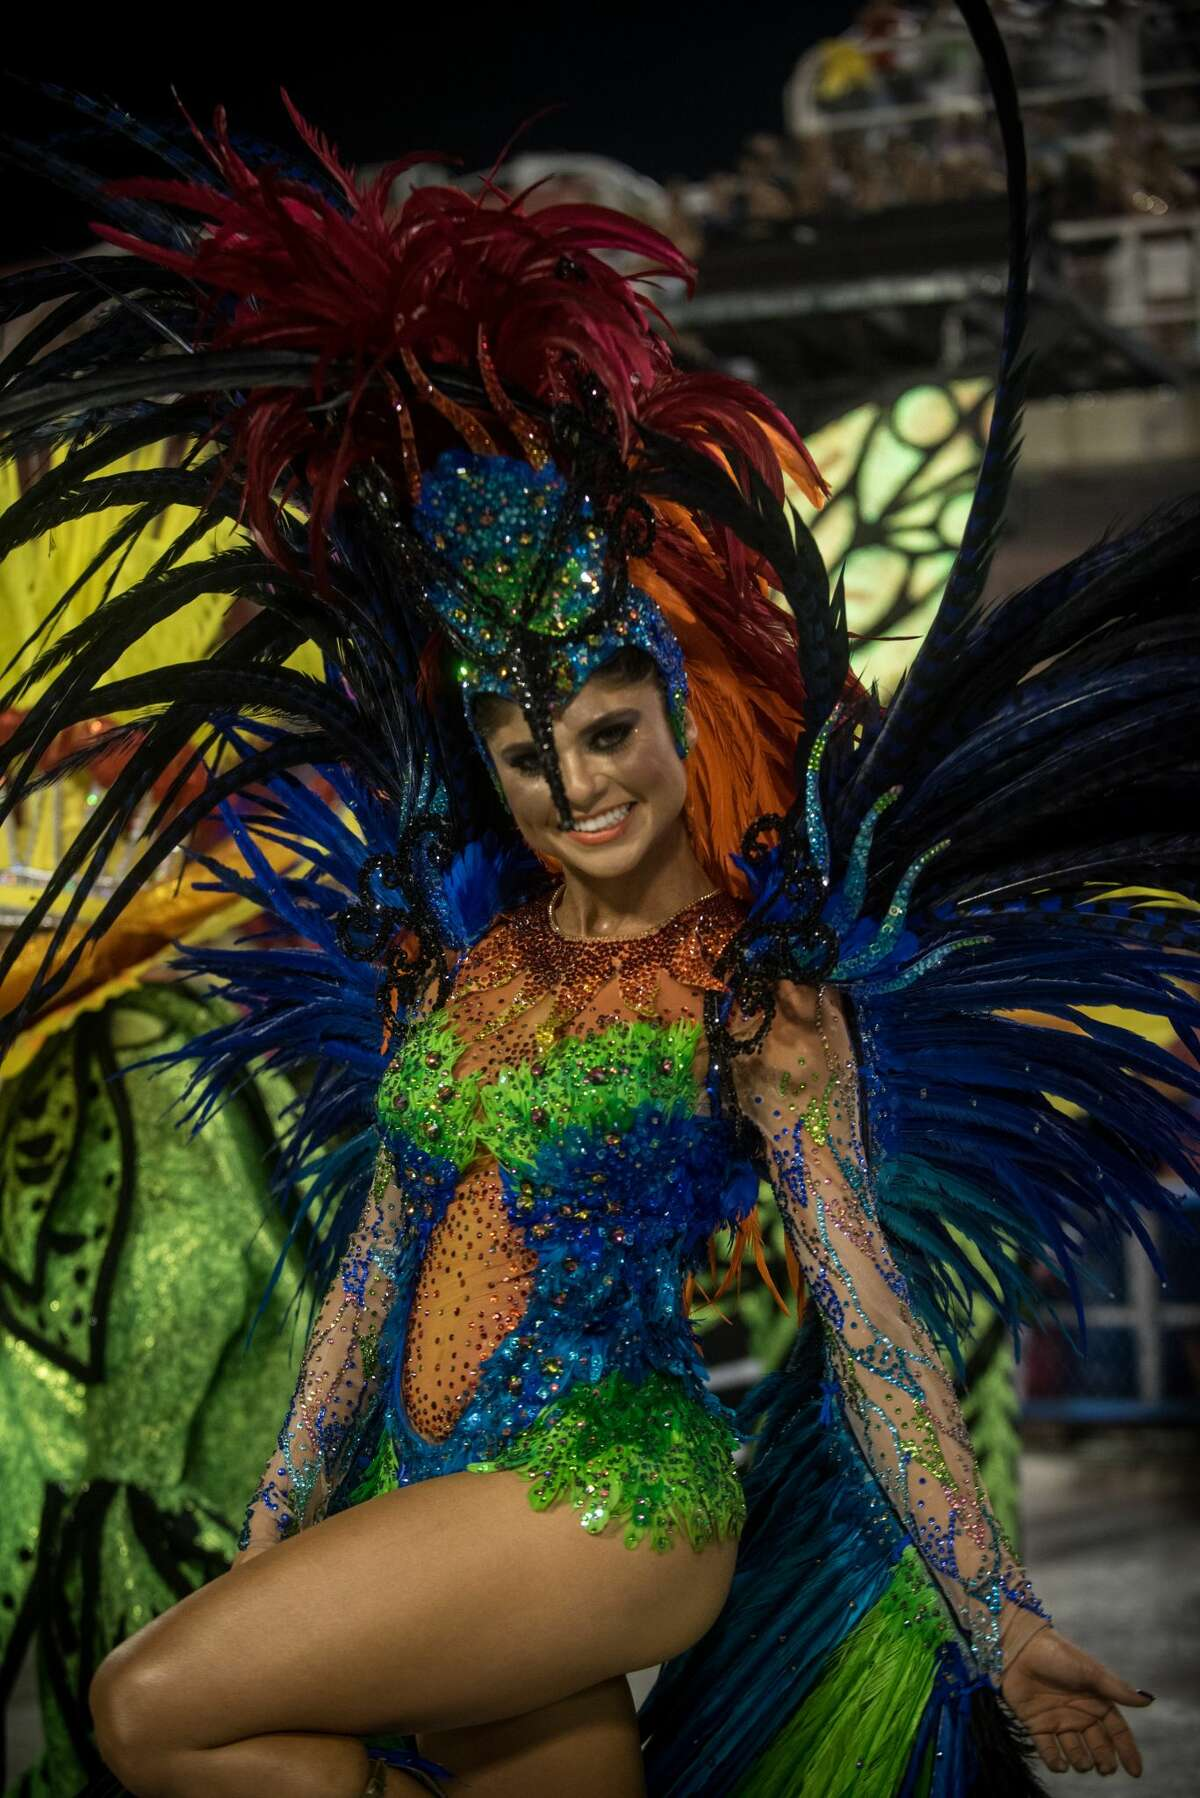 Actress Julianne Trevisol dances during Grande Rio performance at the Rio de Janeiro Carnival at Sambodromo on February 26, 2017 in Rio de Janeiro, Brazil. Keep clicking for more amazing photos taken at Carnival Rio.